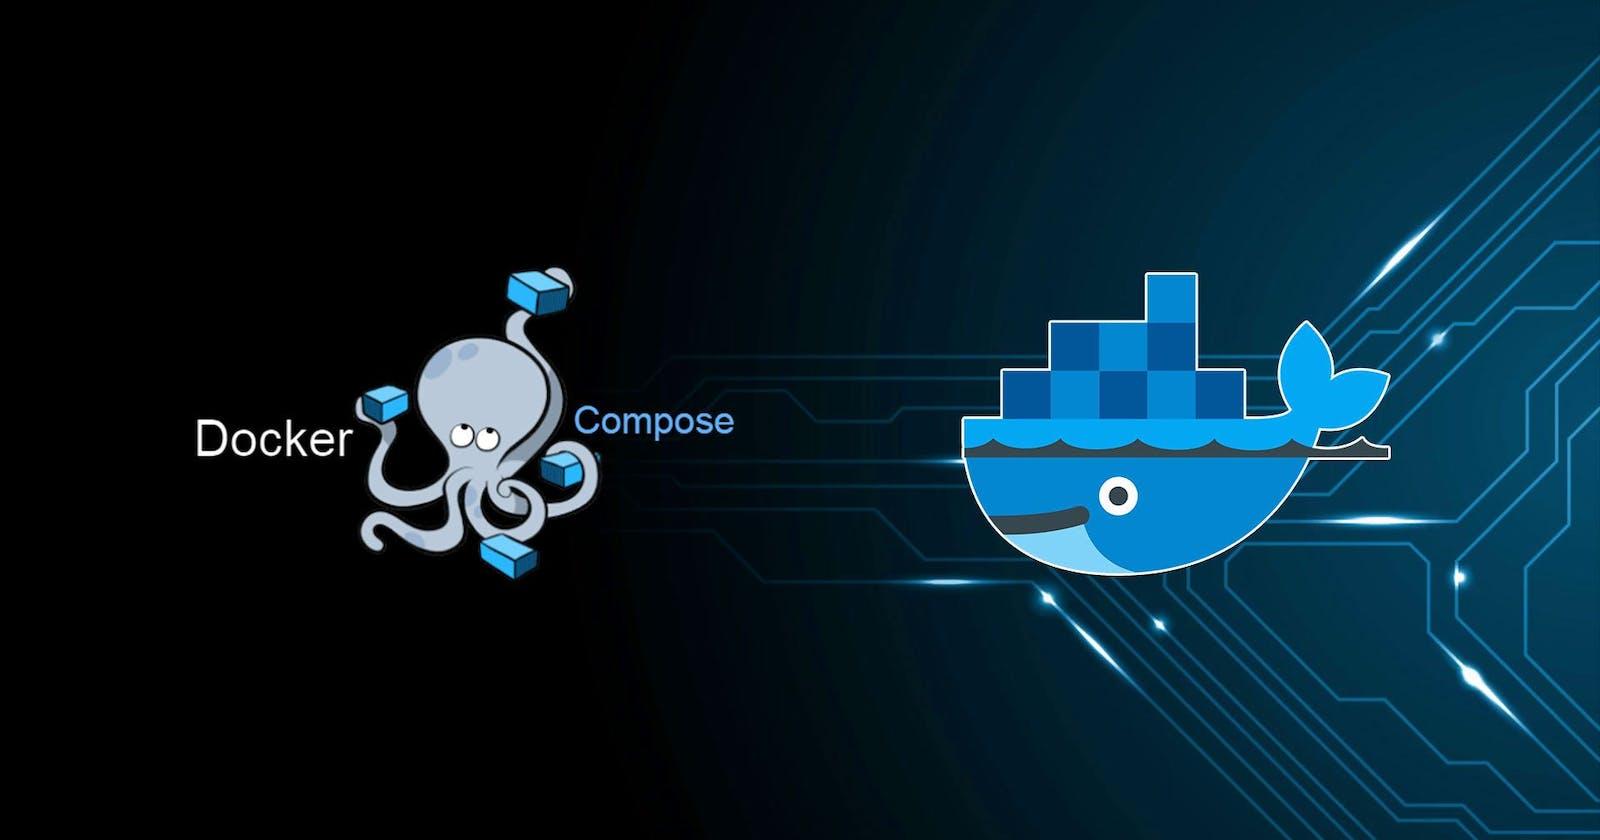 Moving from Vagrant to Docker & Docker Compose: Docker compose